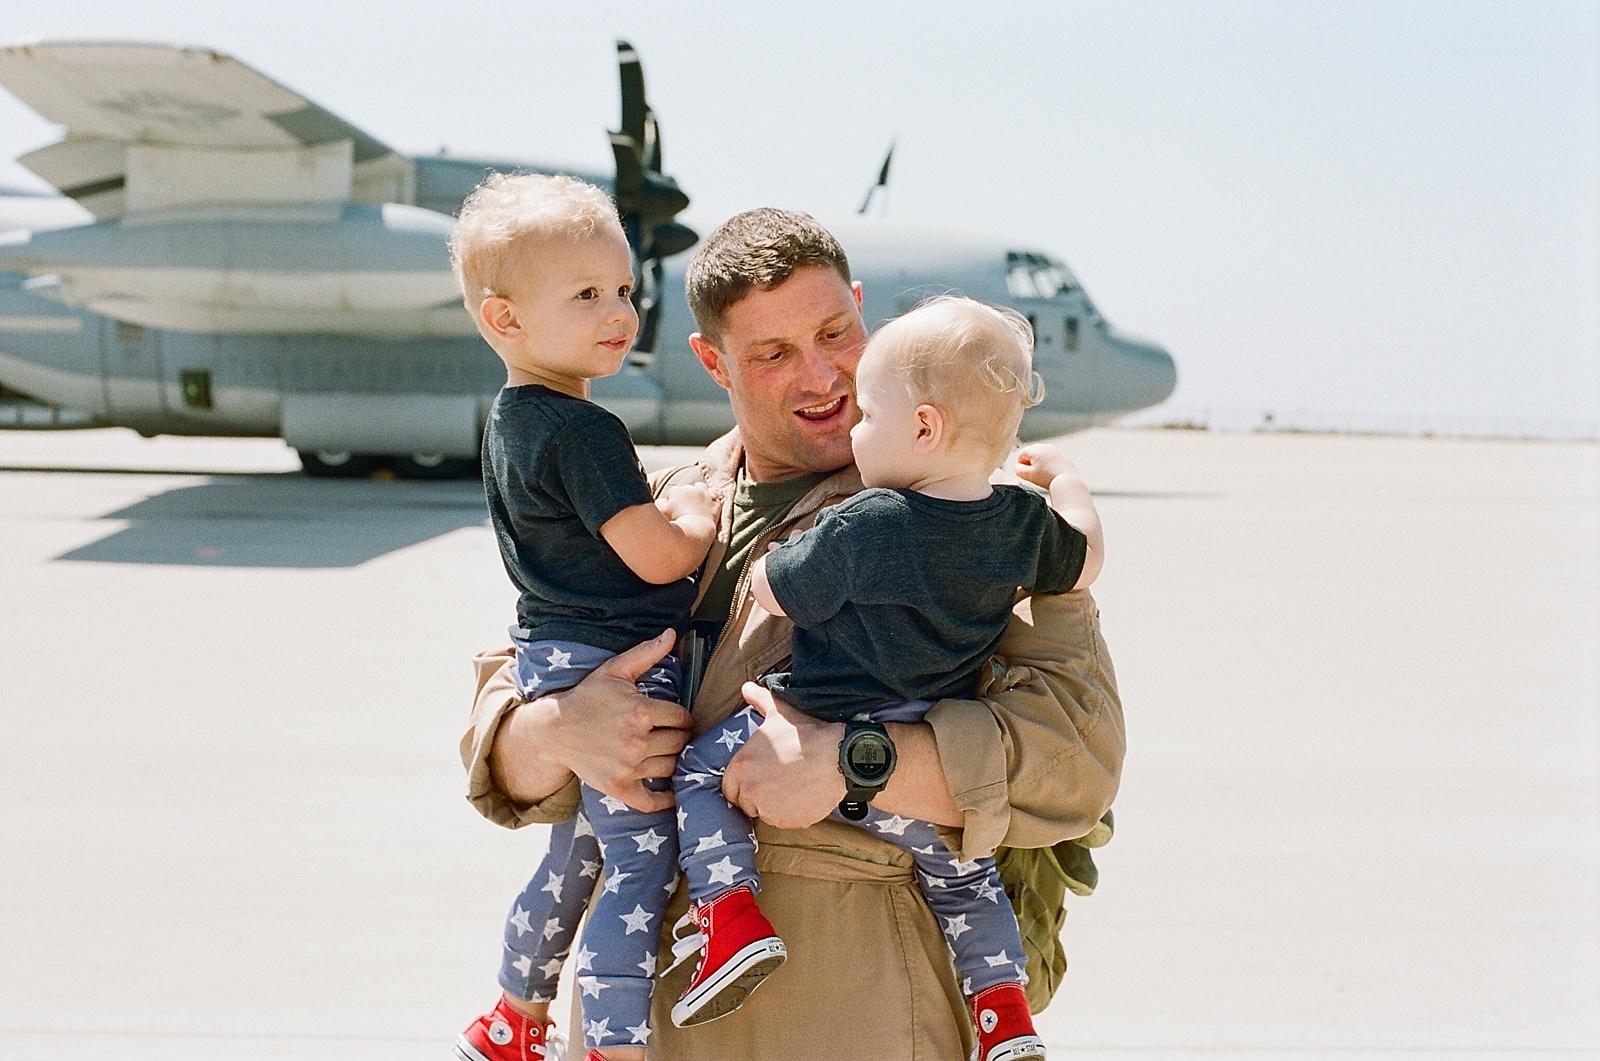 Marine Corps C130 Homecoming at MCAS Miramar from San Diego military homecoming photographer Lauren Nygard